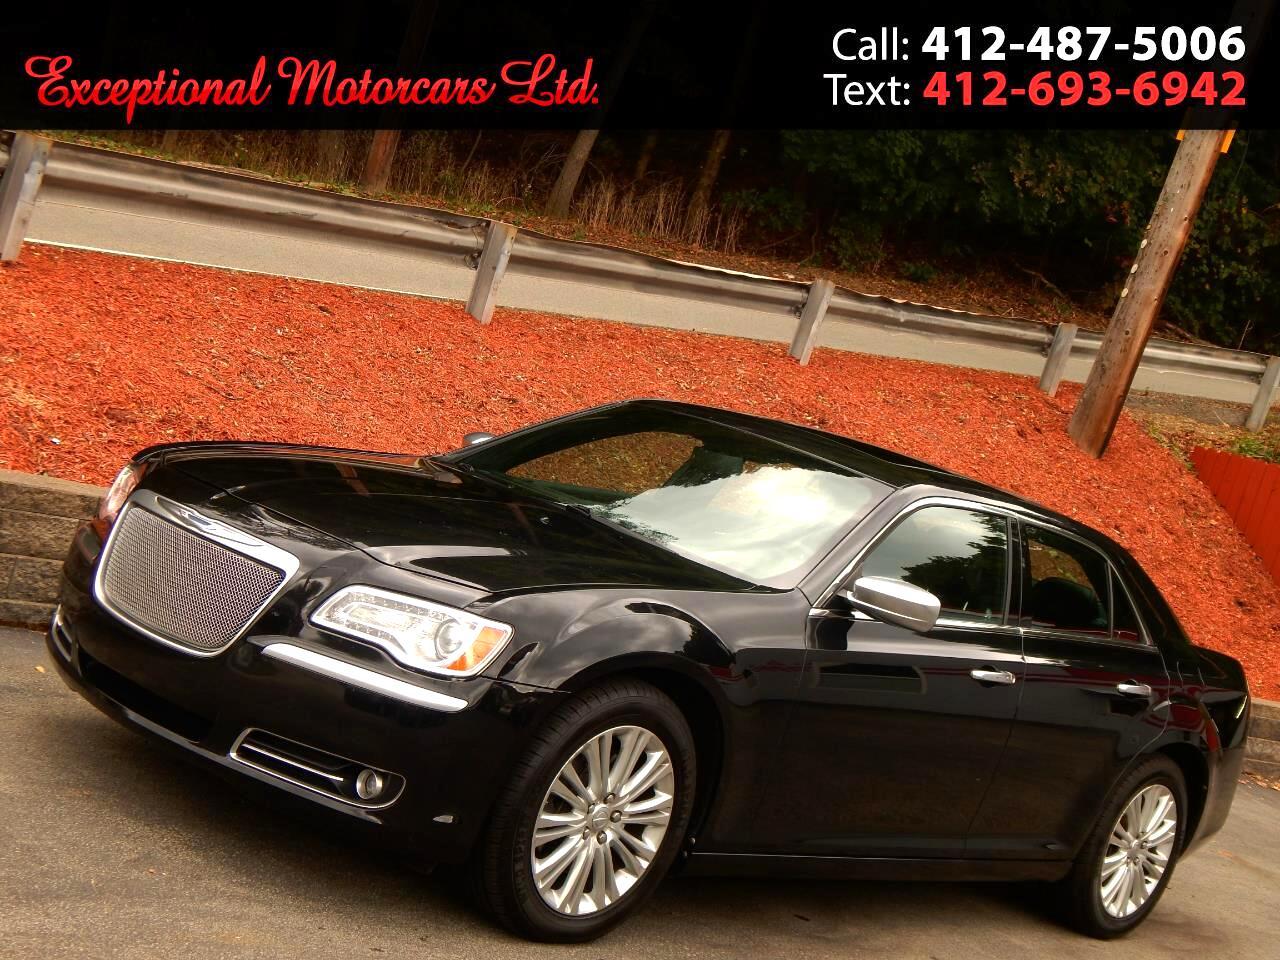 2013 Chrysler 300 4dr Sdn 300C John Varvatos Luxury Edition AWD